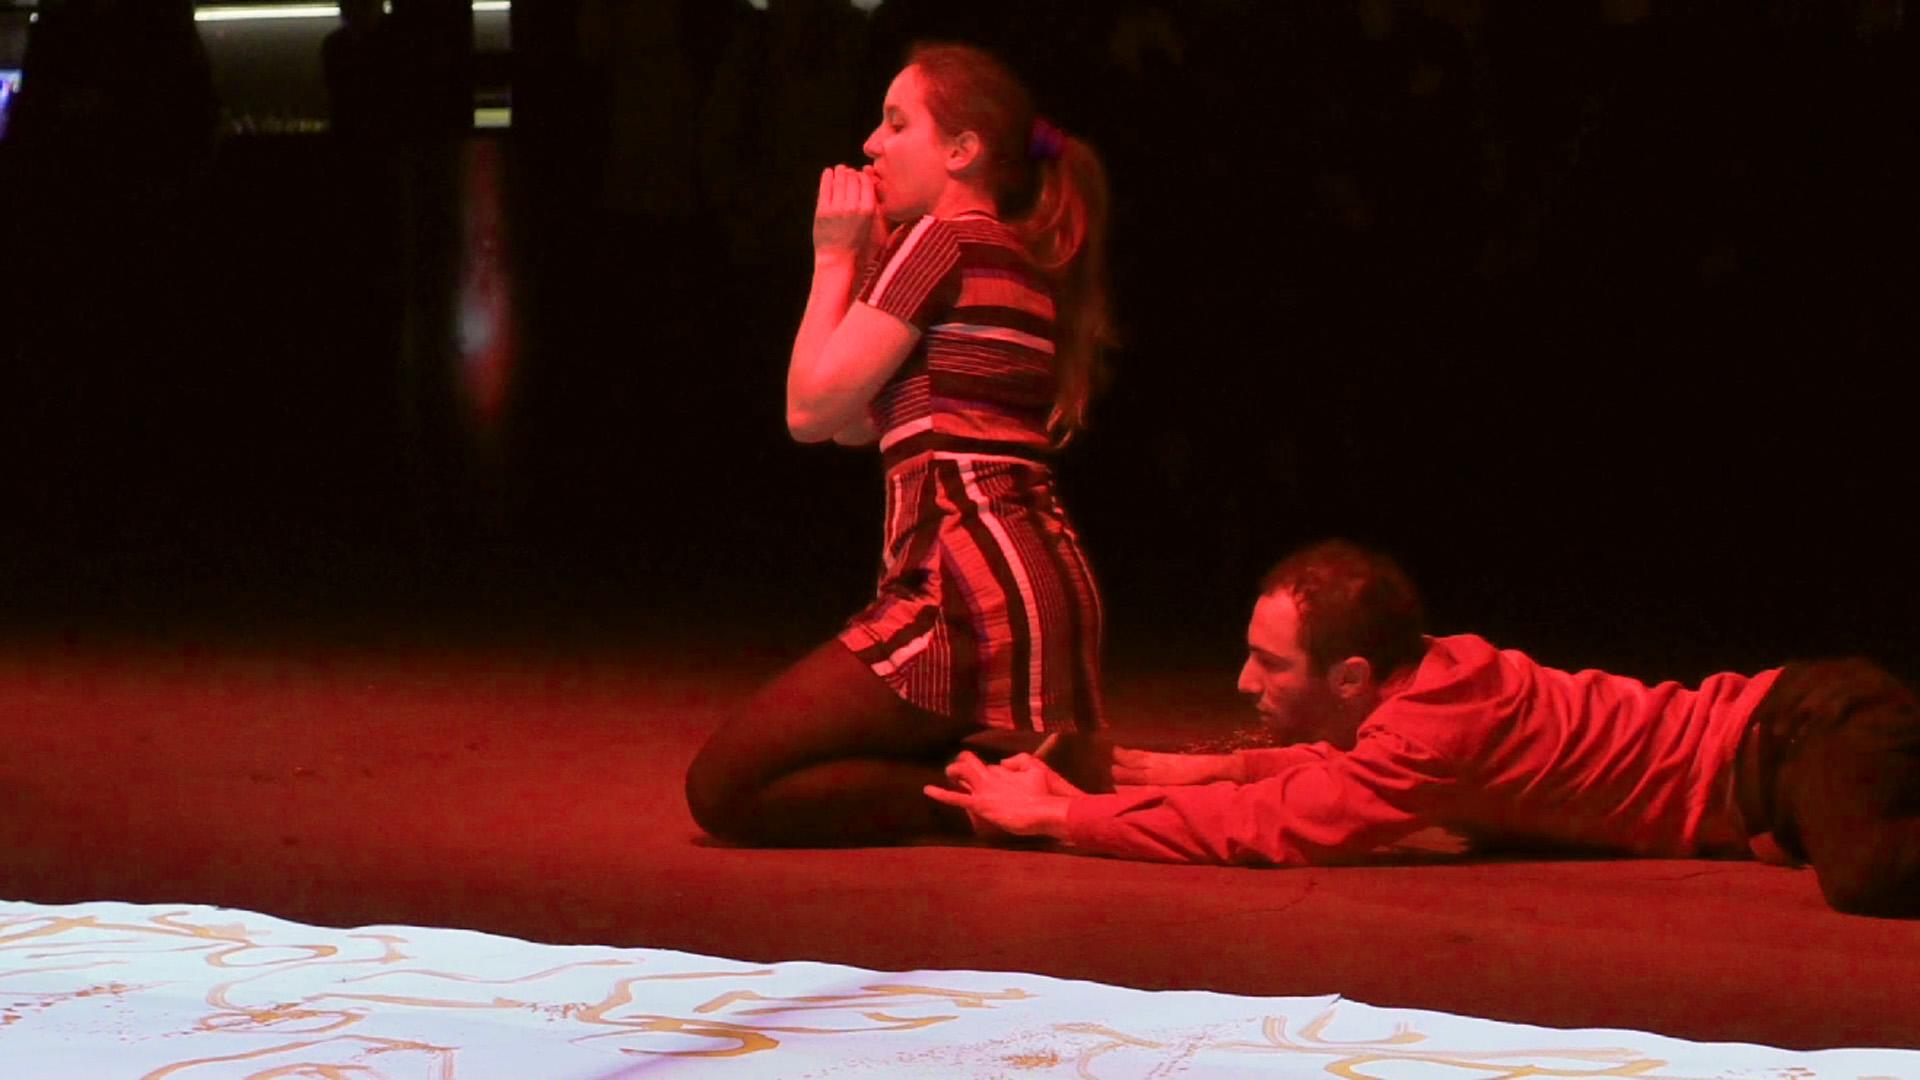 2017 17_Periferika Performing Art Place_17_lapressionedelrosso_frame10_Francesca Pignanelli